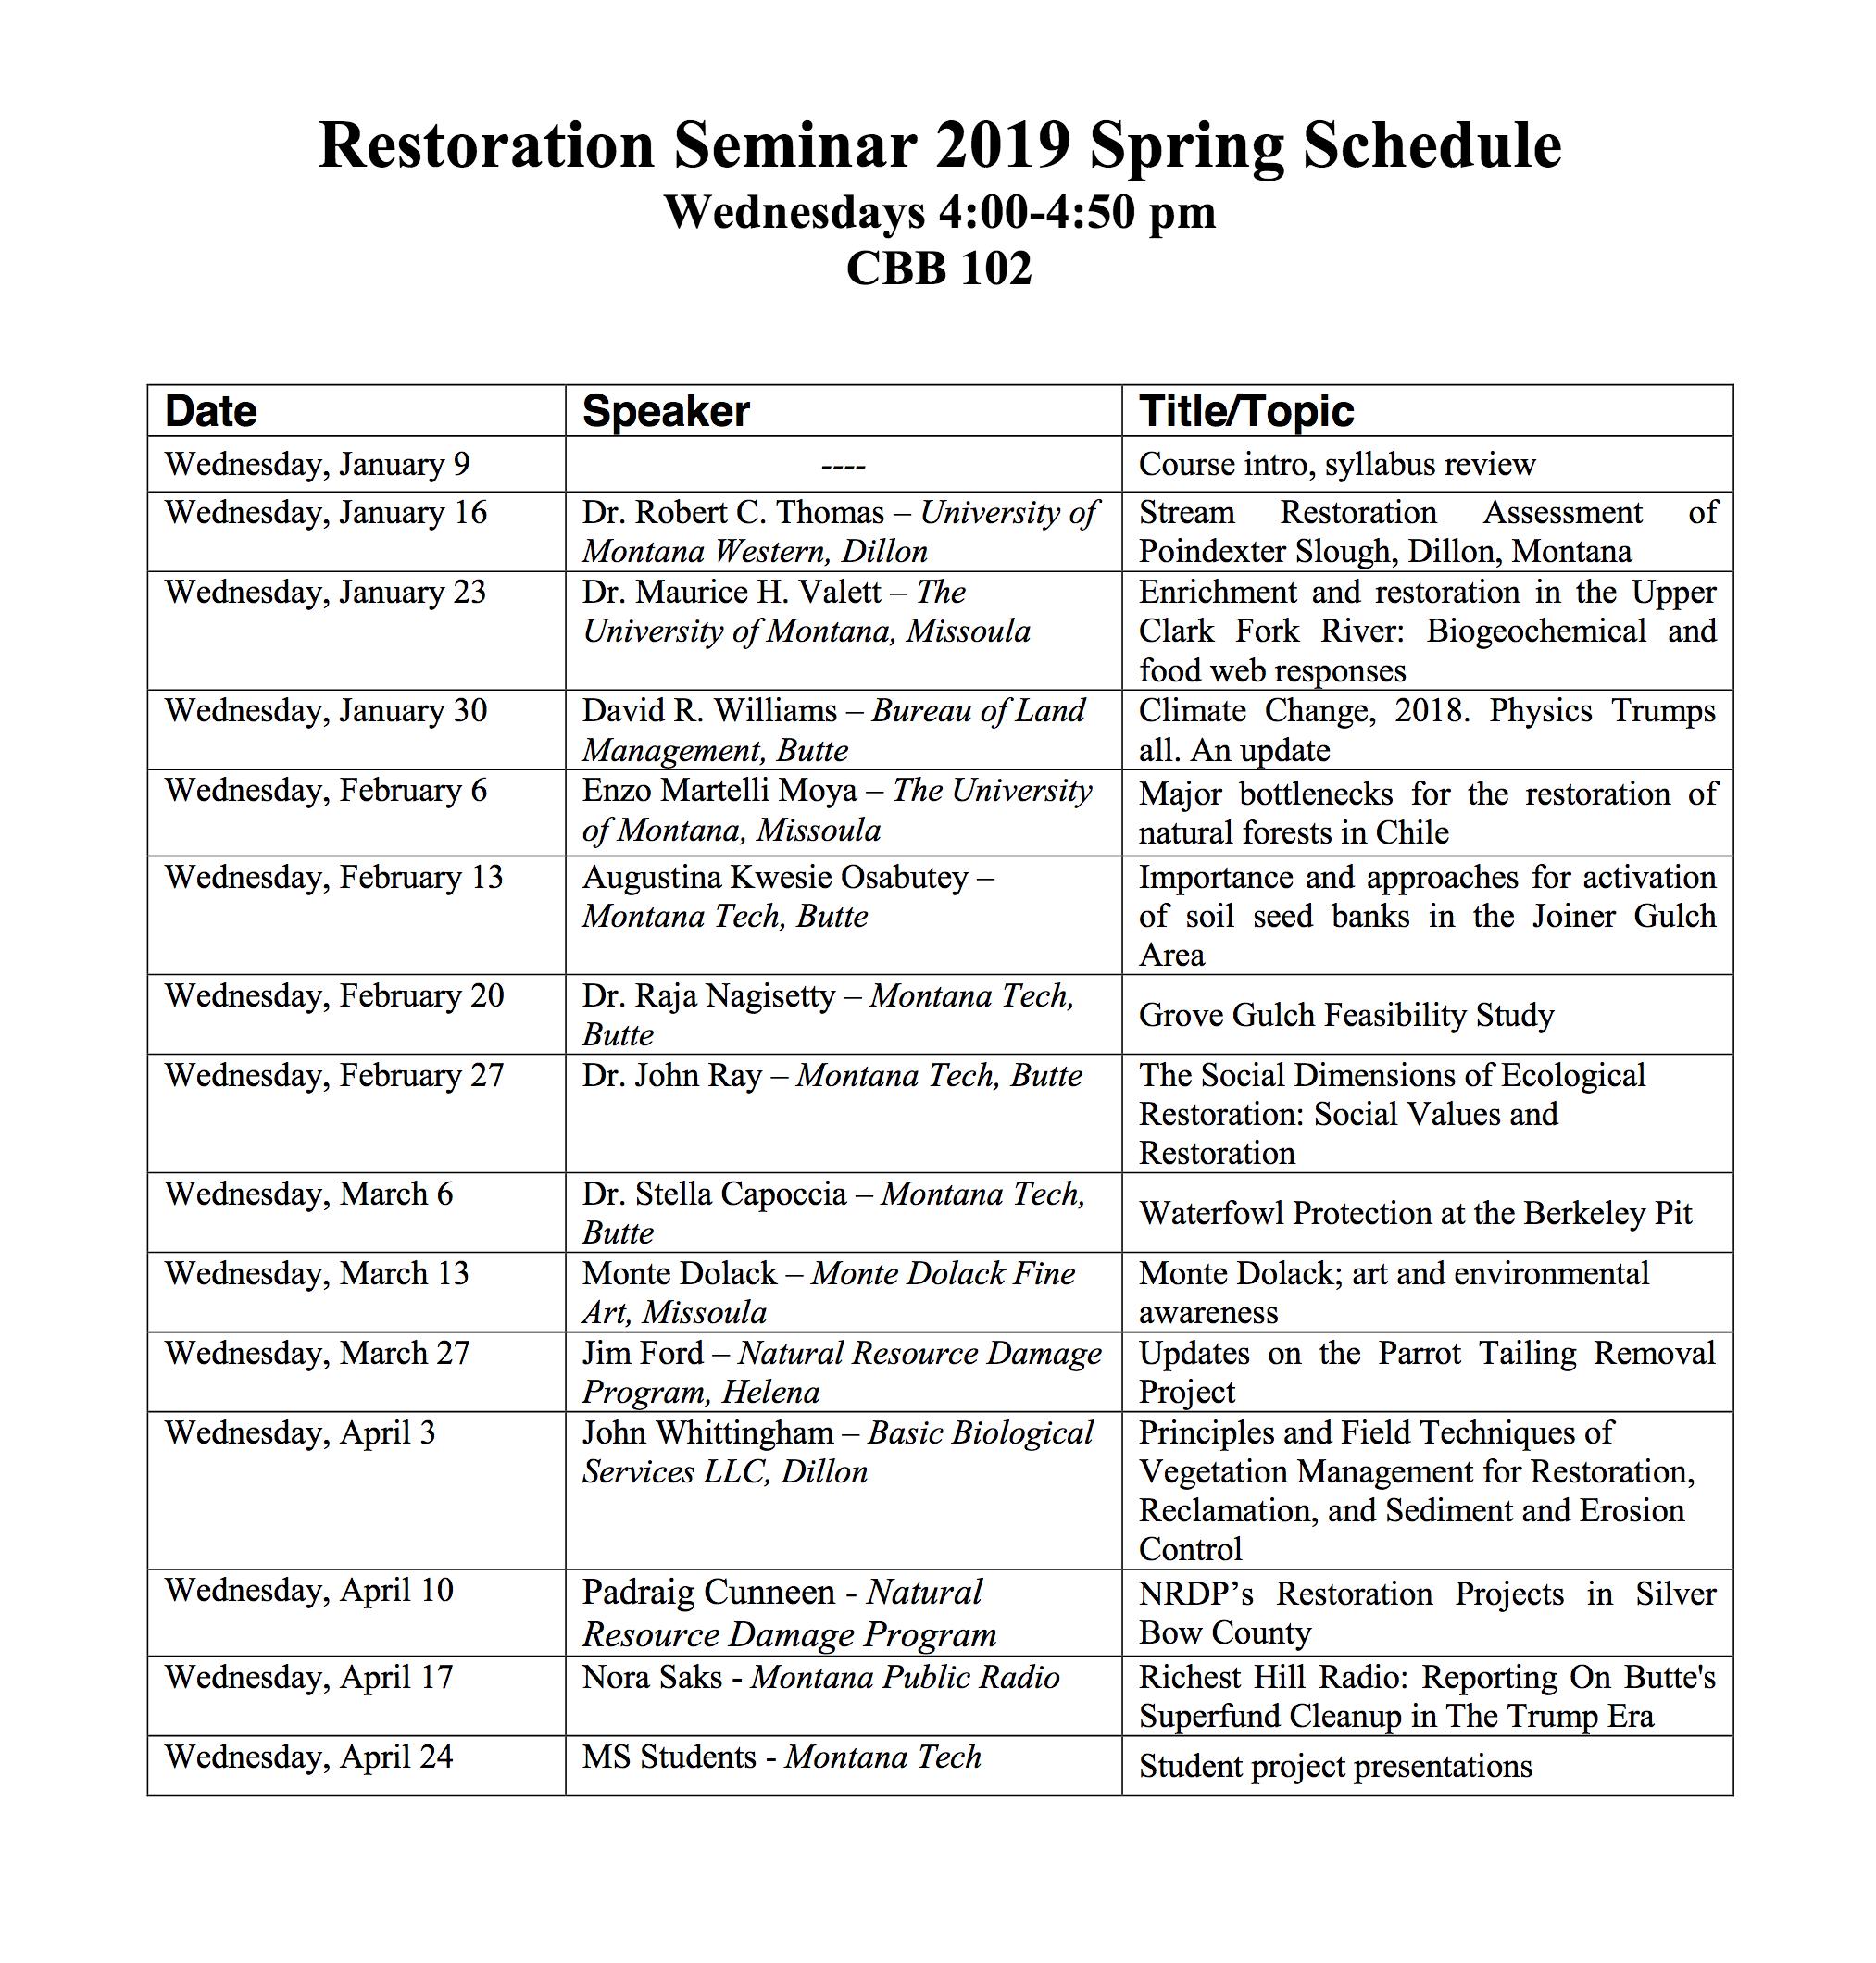 2019 Restoration Seminar.png